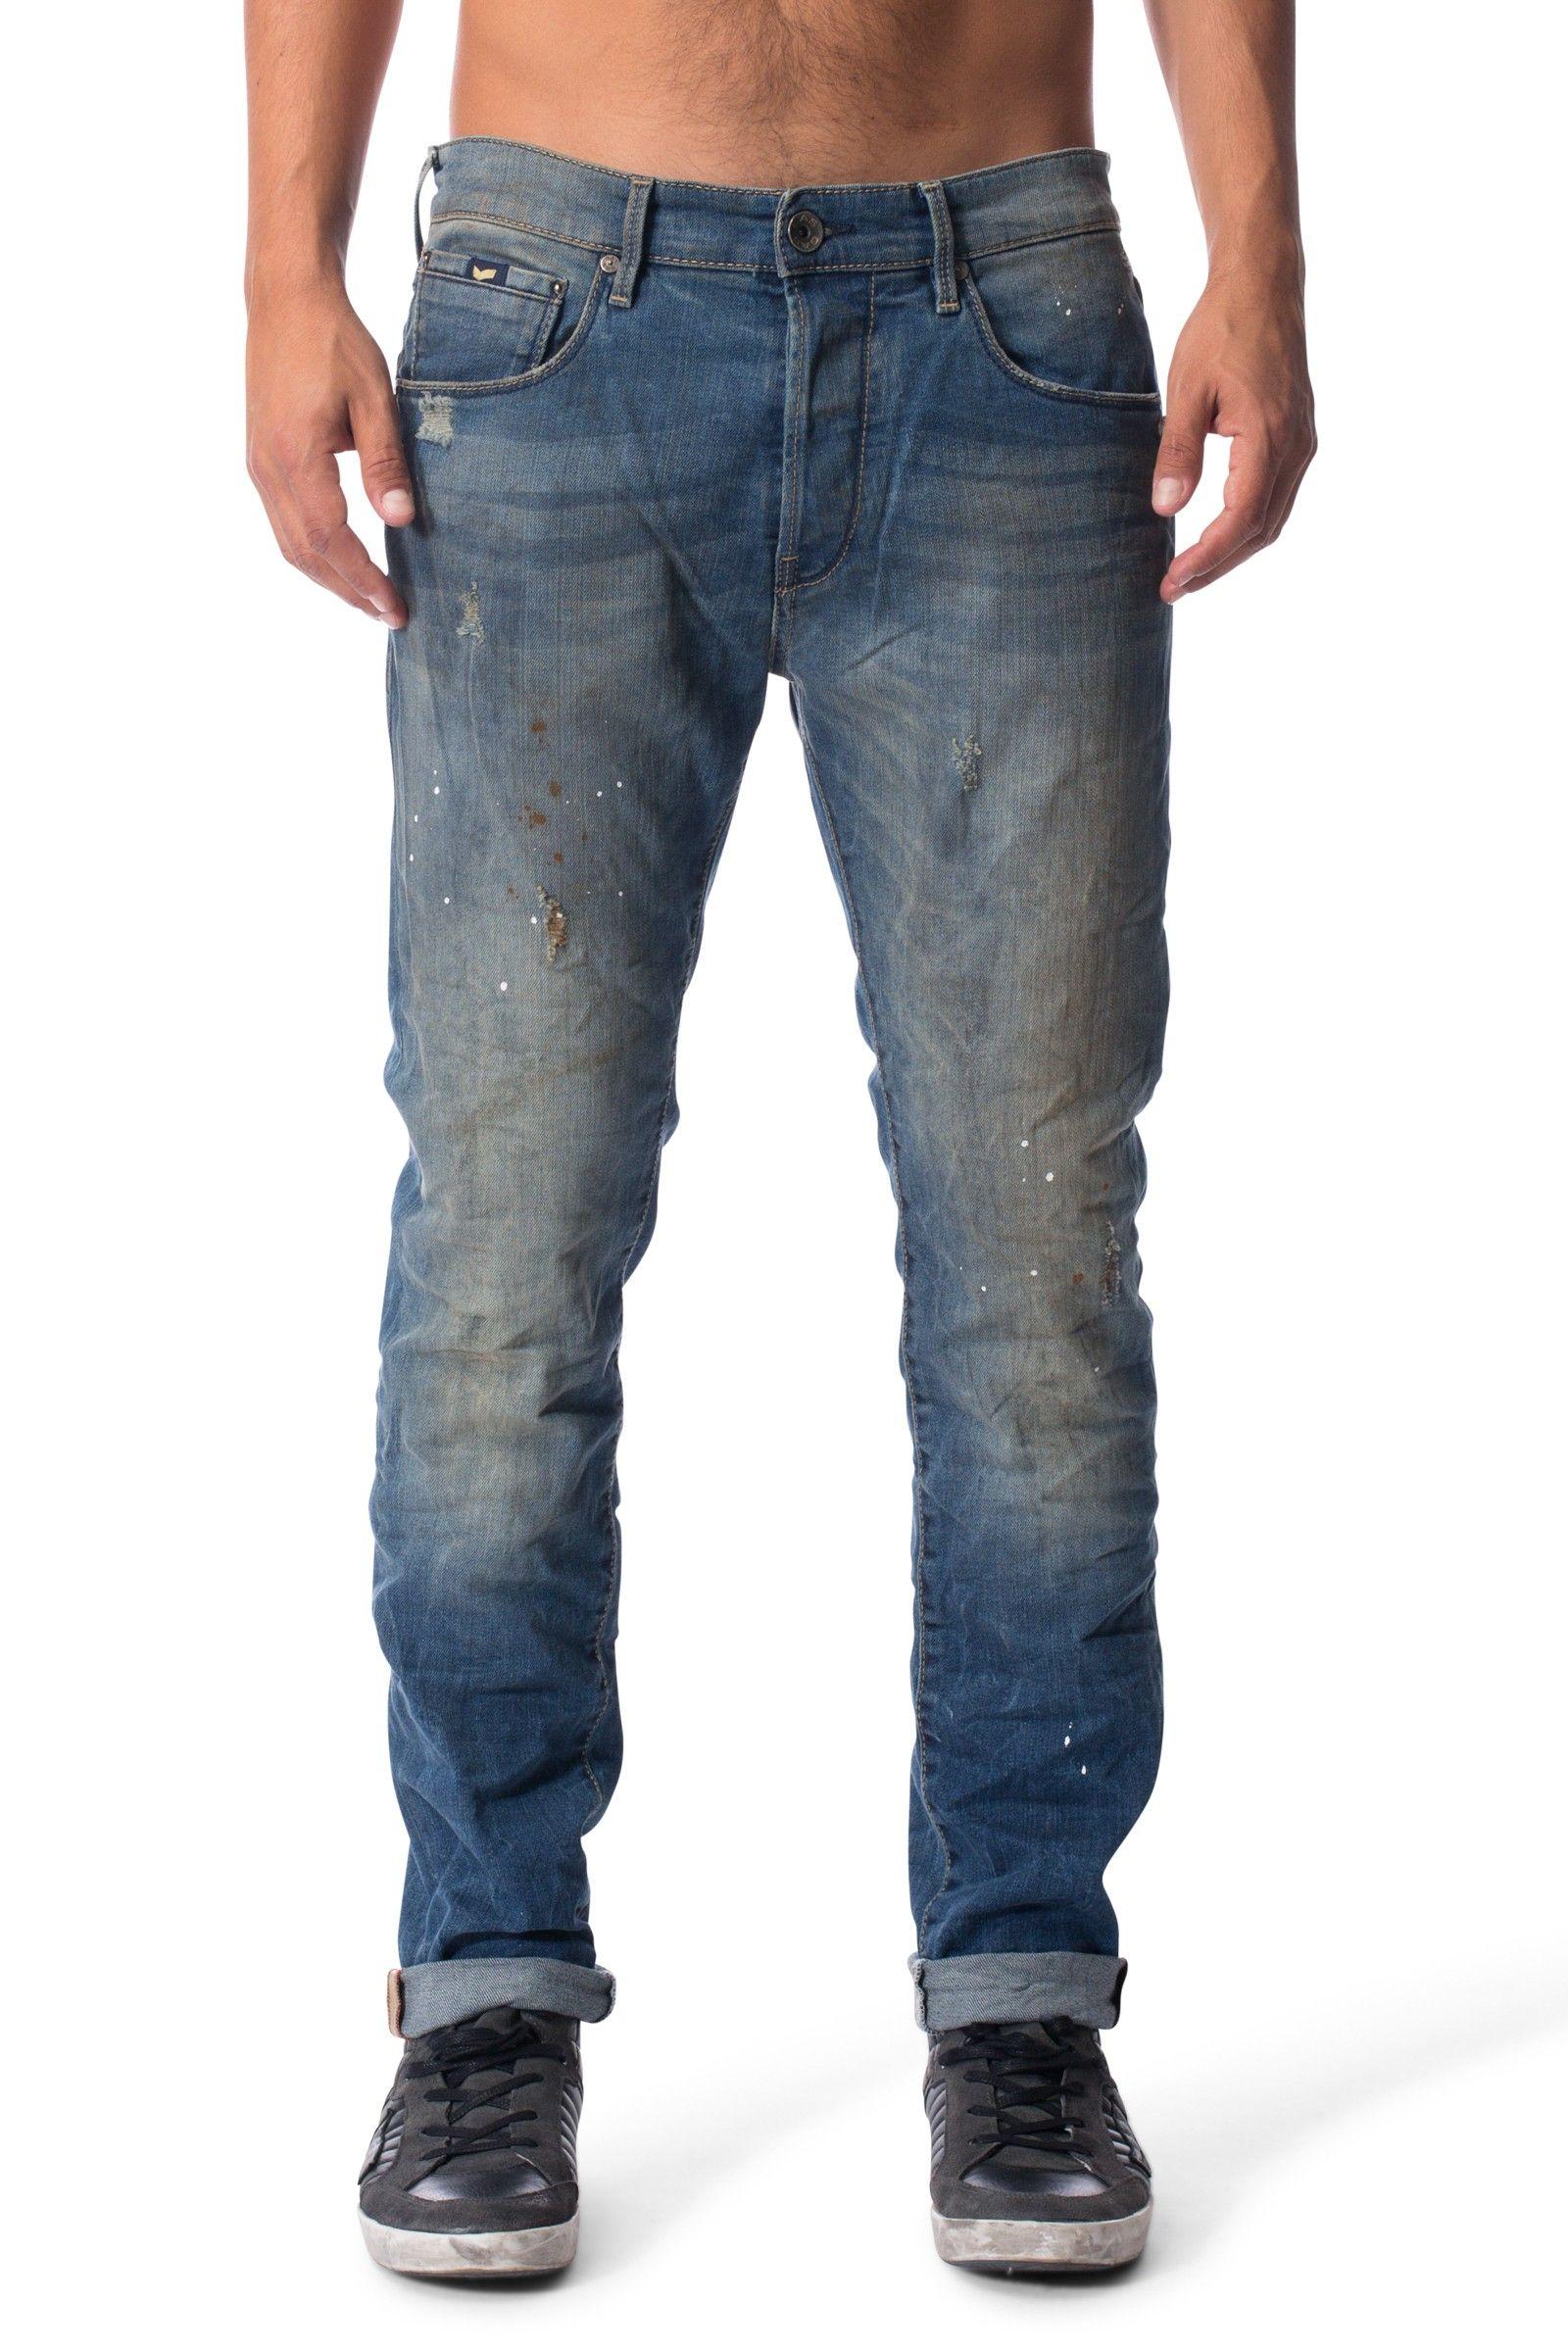 336e0d862 RAUL WA95 - rebajas vaqueros - promo - hombre - Gas Jeans online store